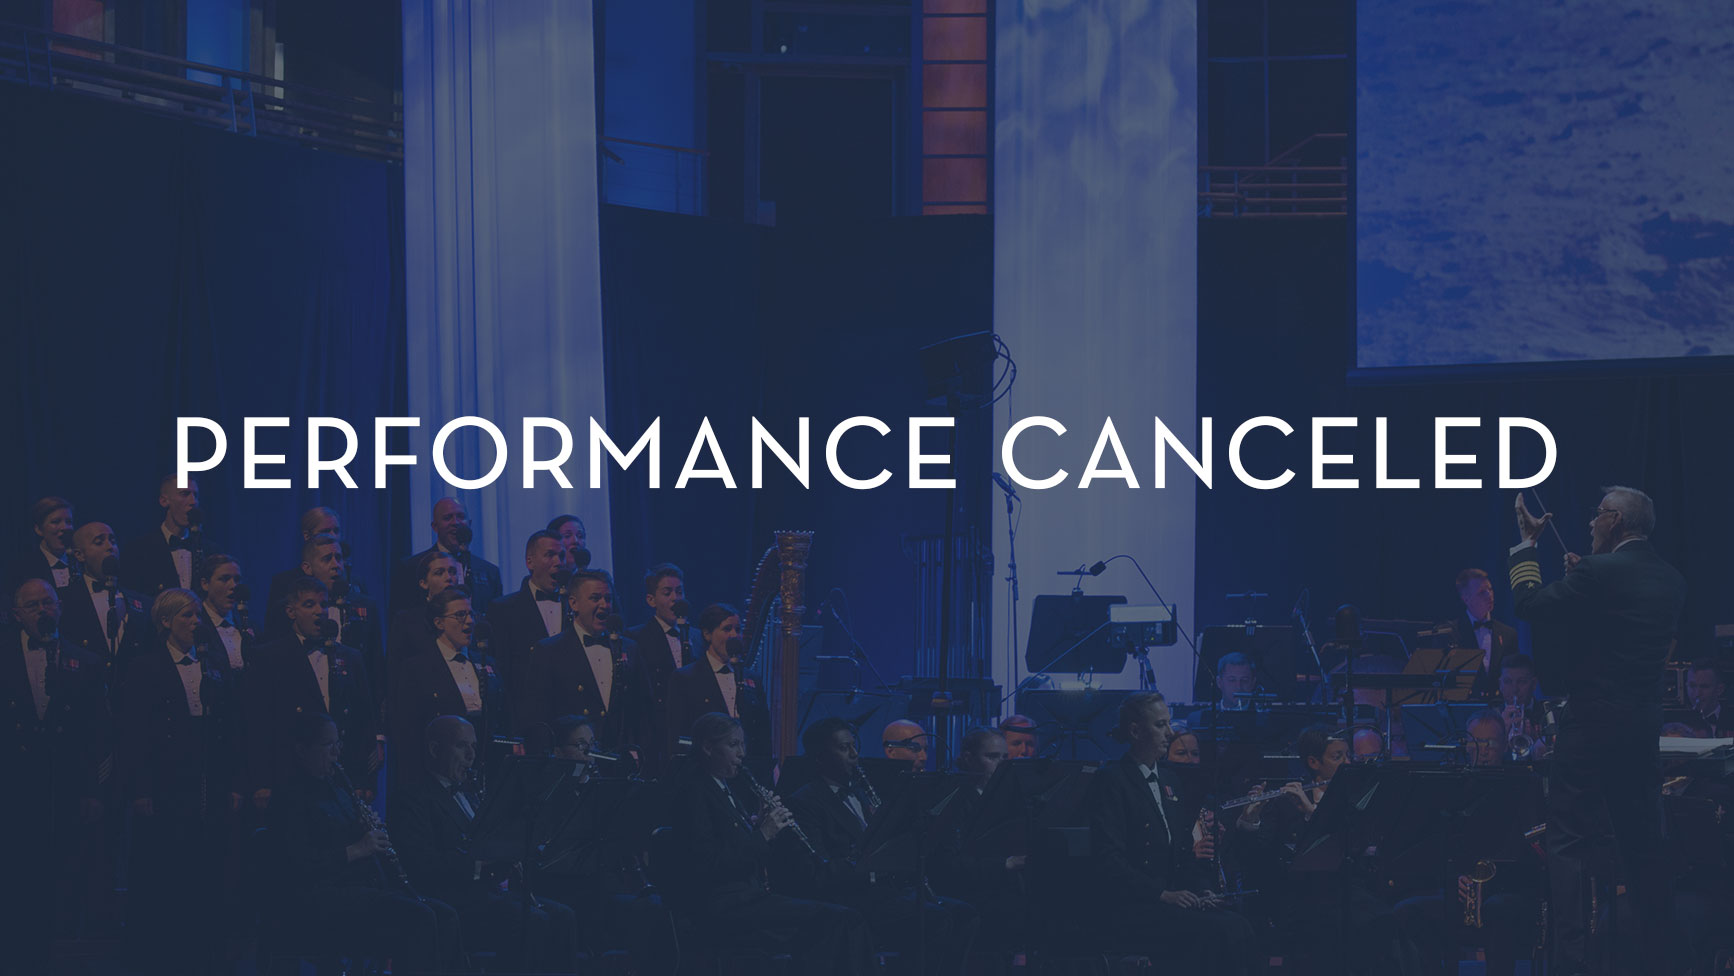 Navy Band Performance Canceled